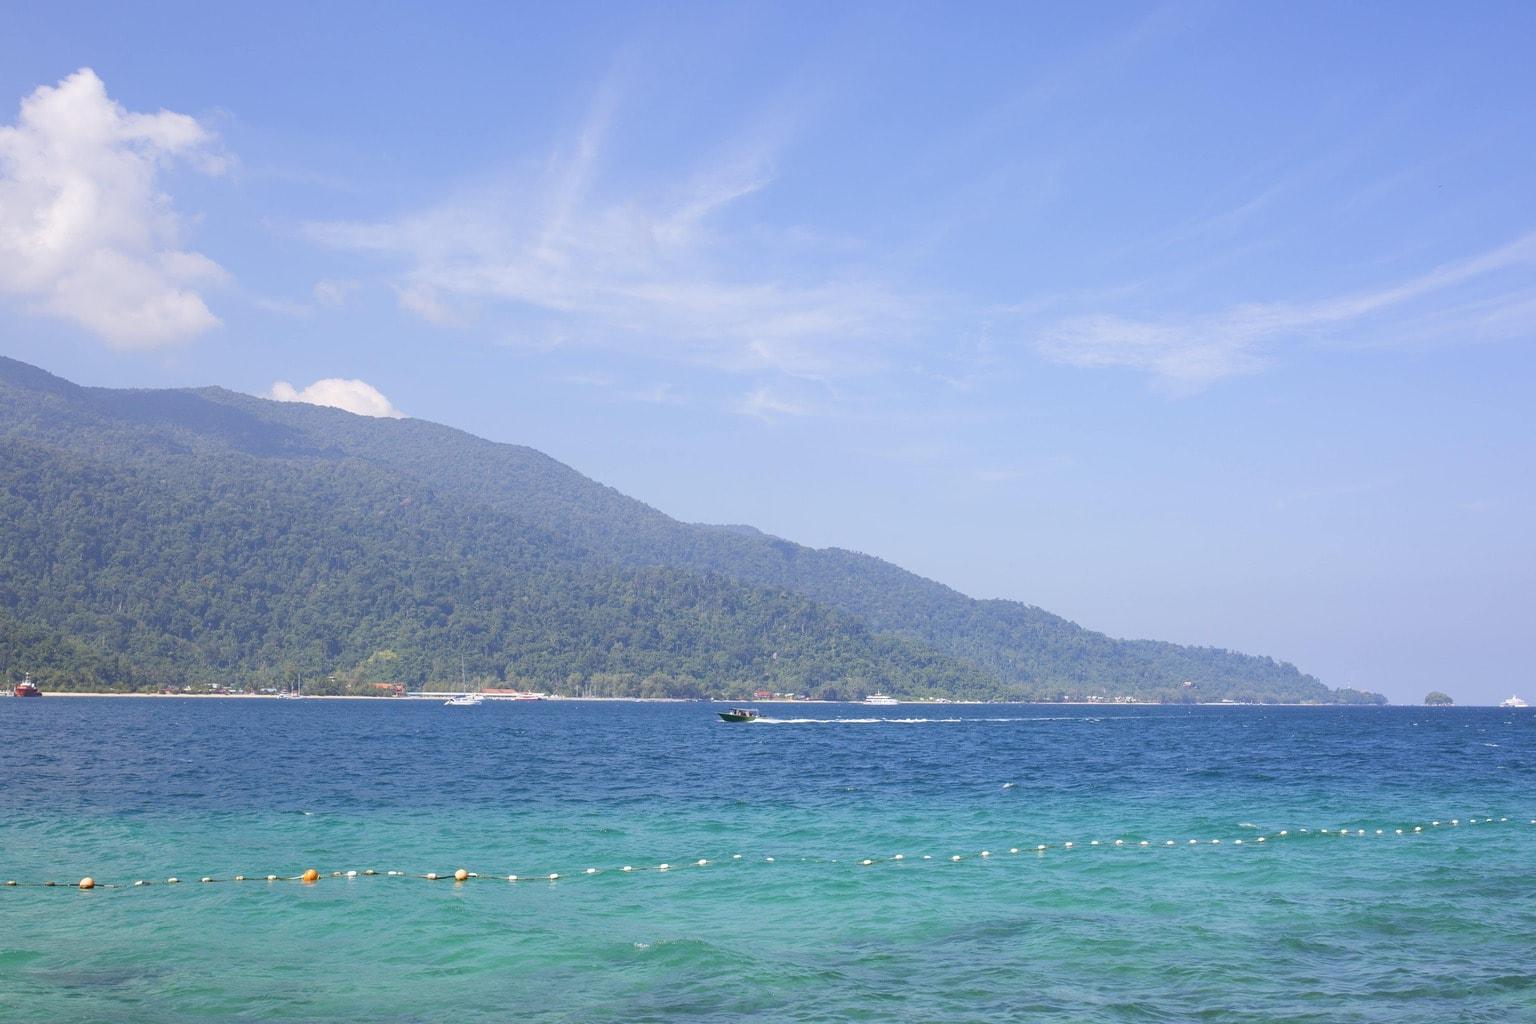 Tioman Island from the ocean